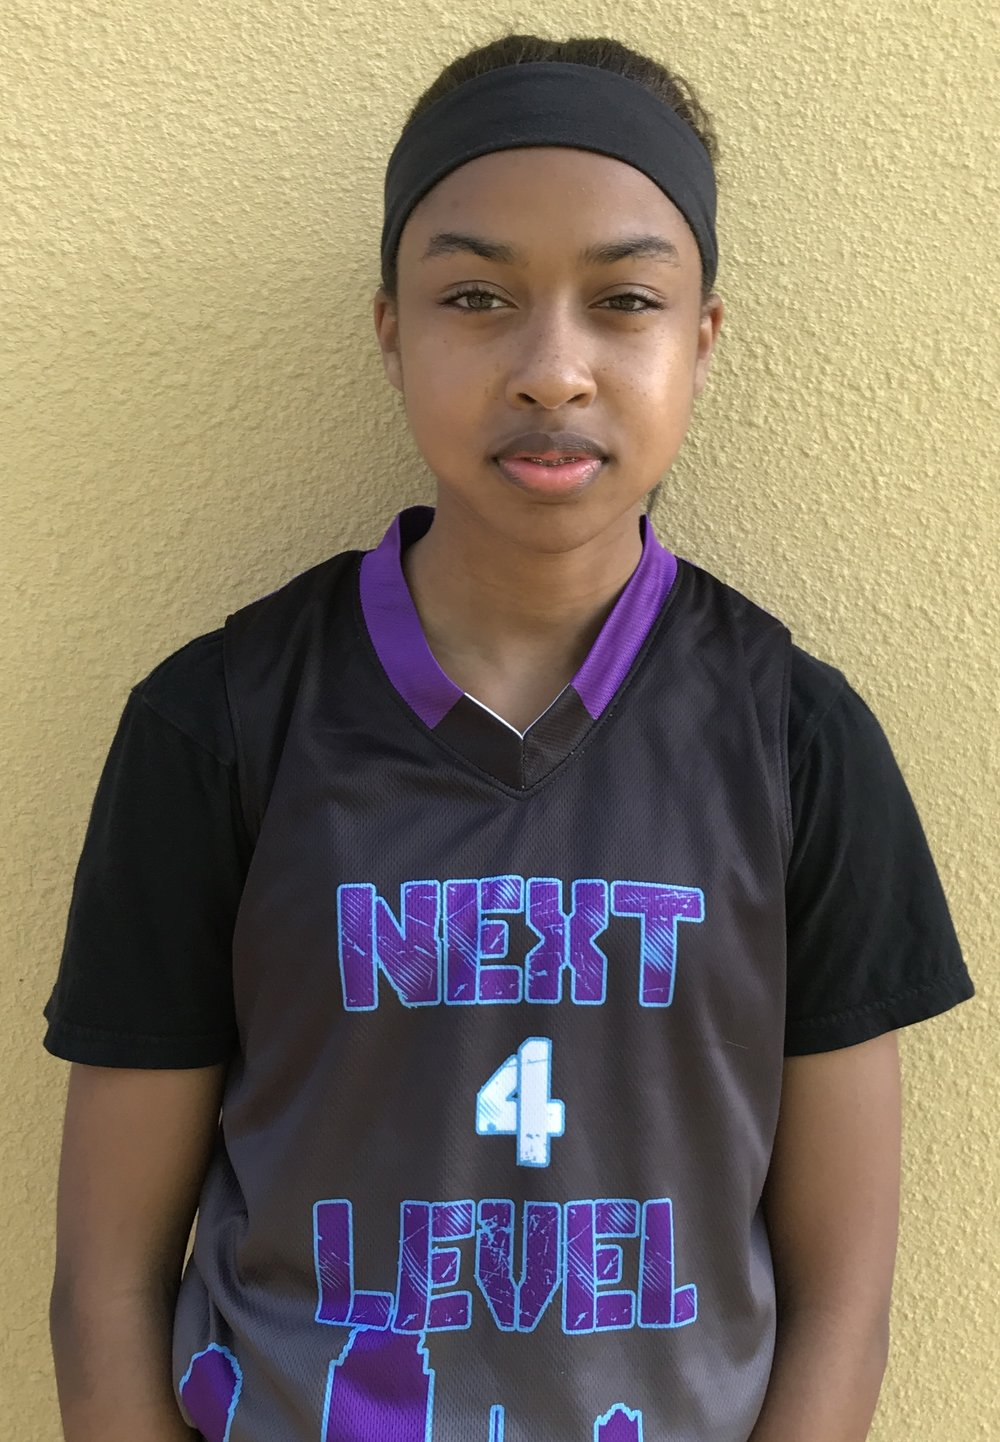 Kalea Hudson #4    School:Lamar High School    Grade:9th    Height: 5'6    Weight: 105    Postion:Guard    Top 5 Colleges:Memphis, Arizona State, UCLA, Arkansas, UCONN